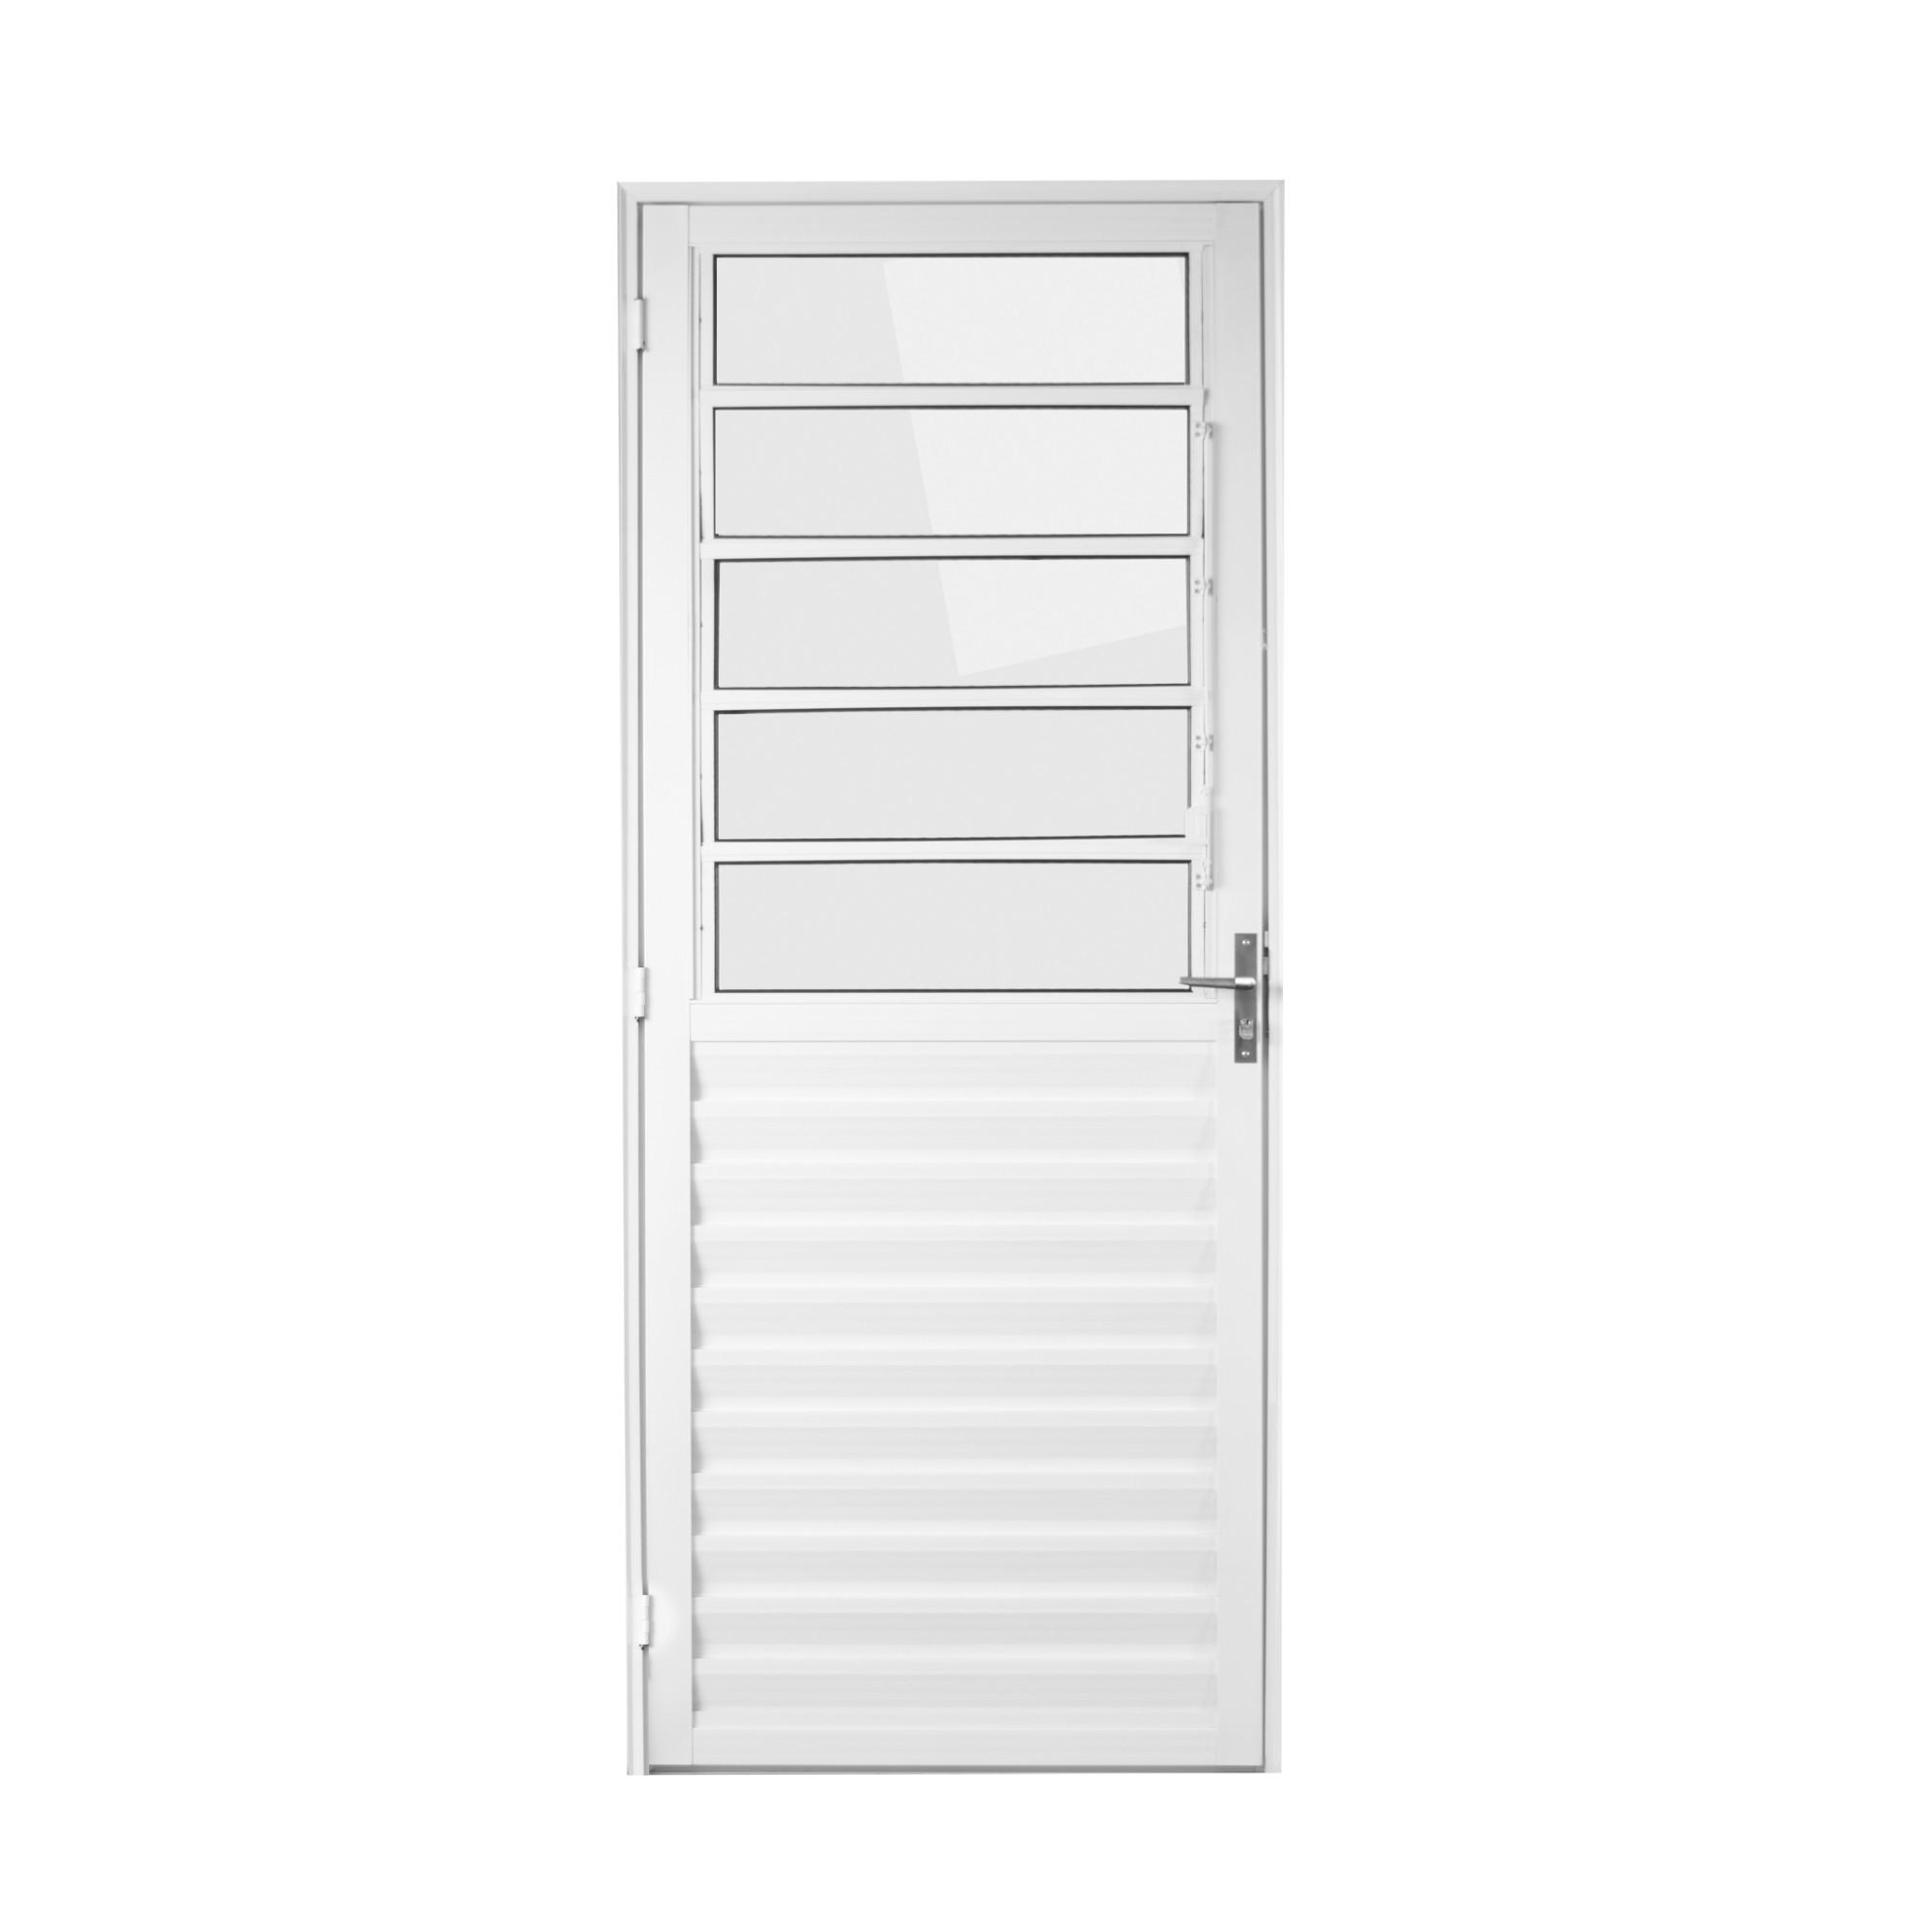 Porta de Abrir de Aluminio Basculante 210x90cm Branca Lado Direito - 33787 - Aluvid